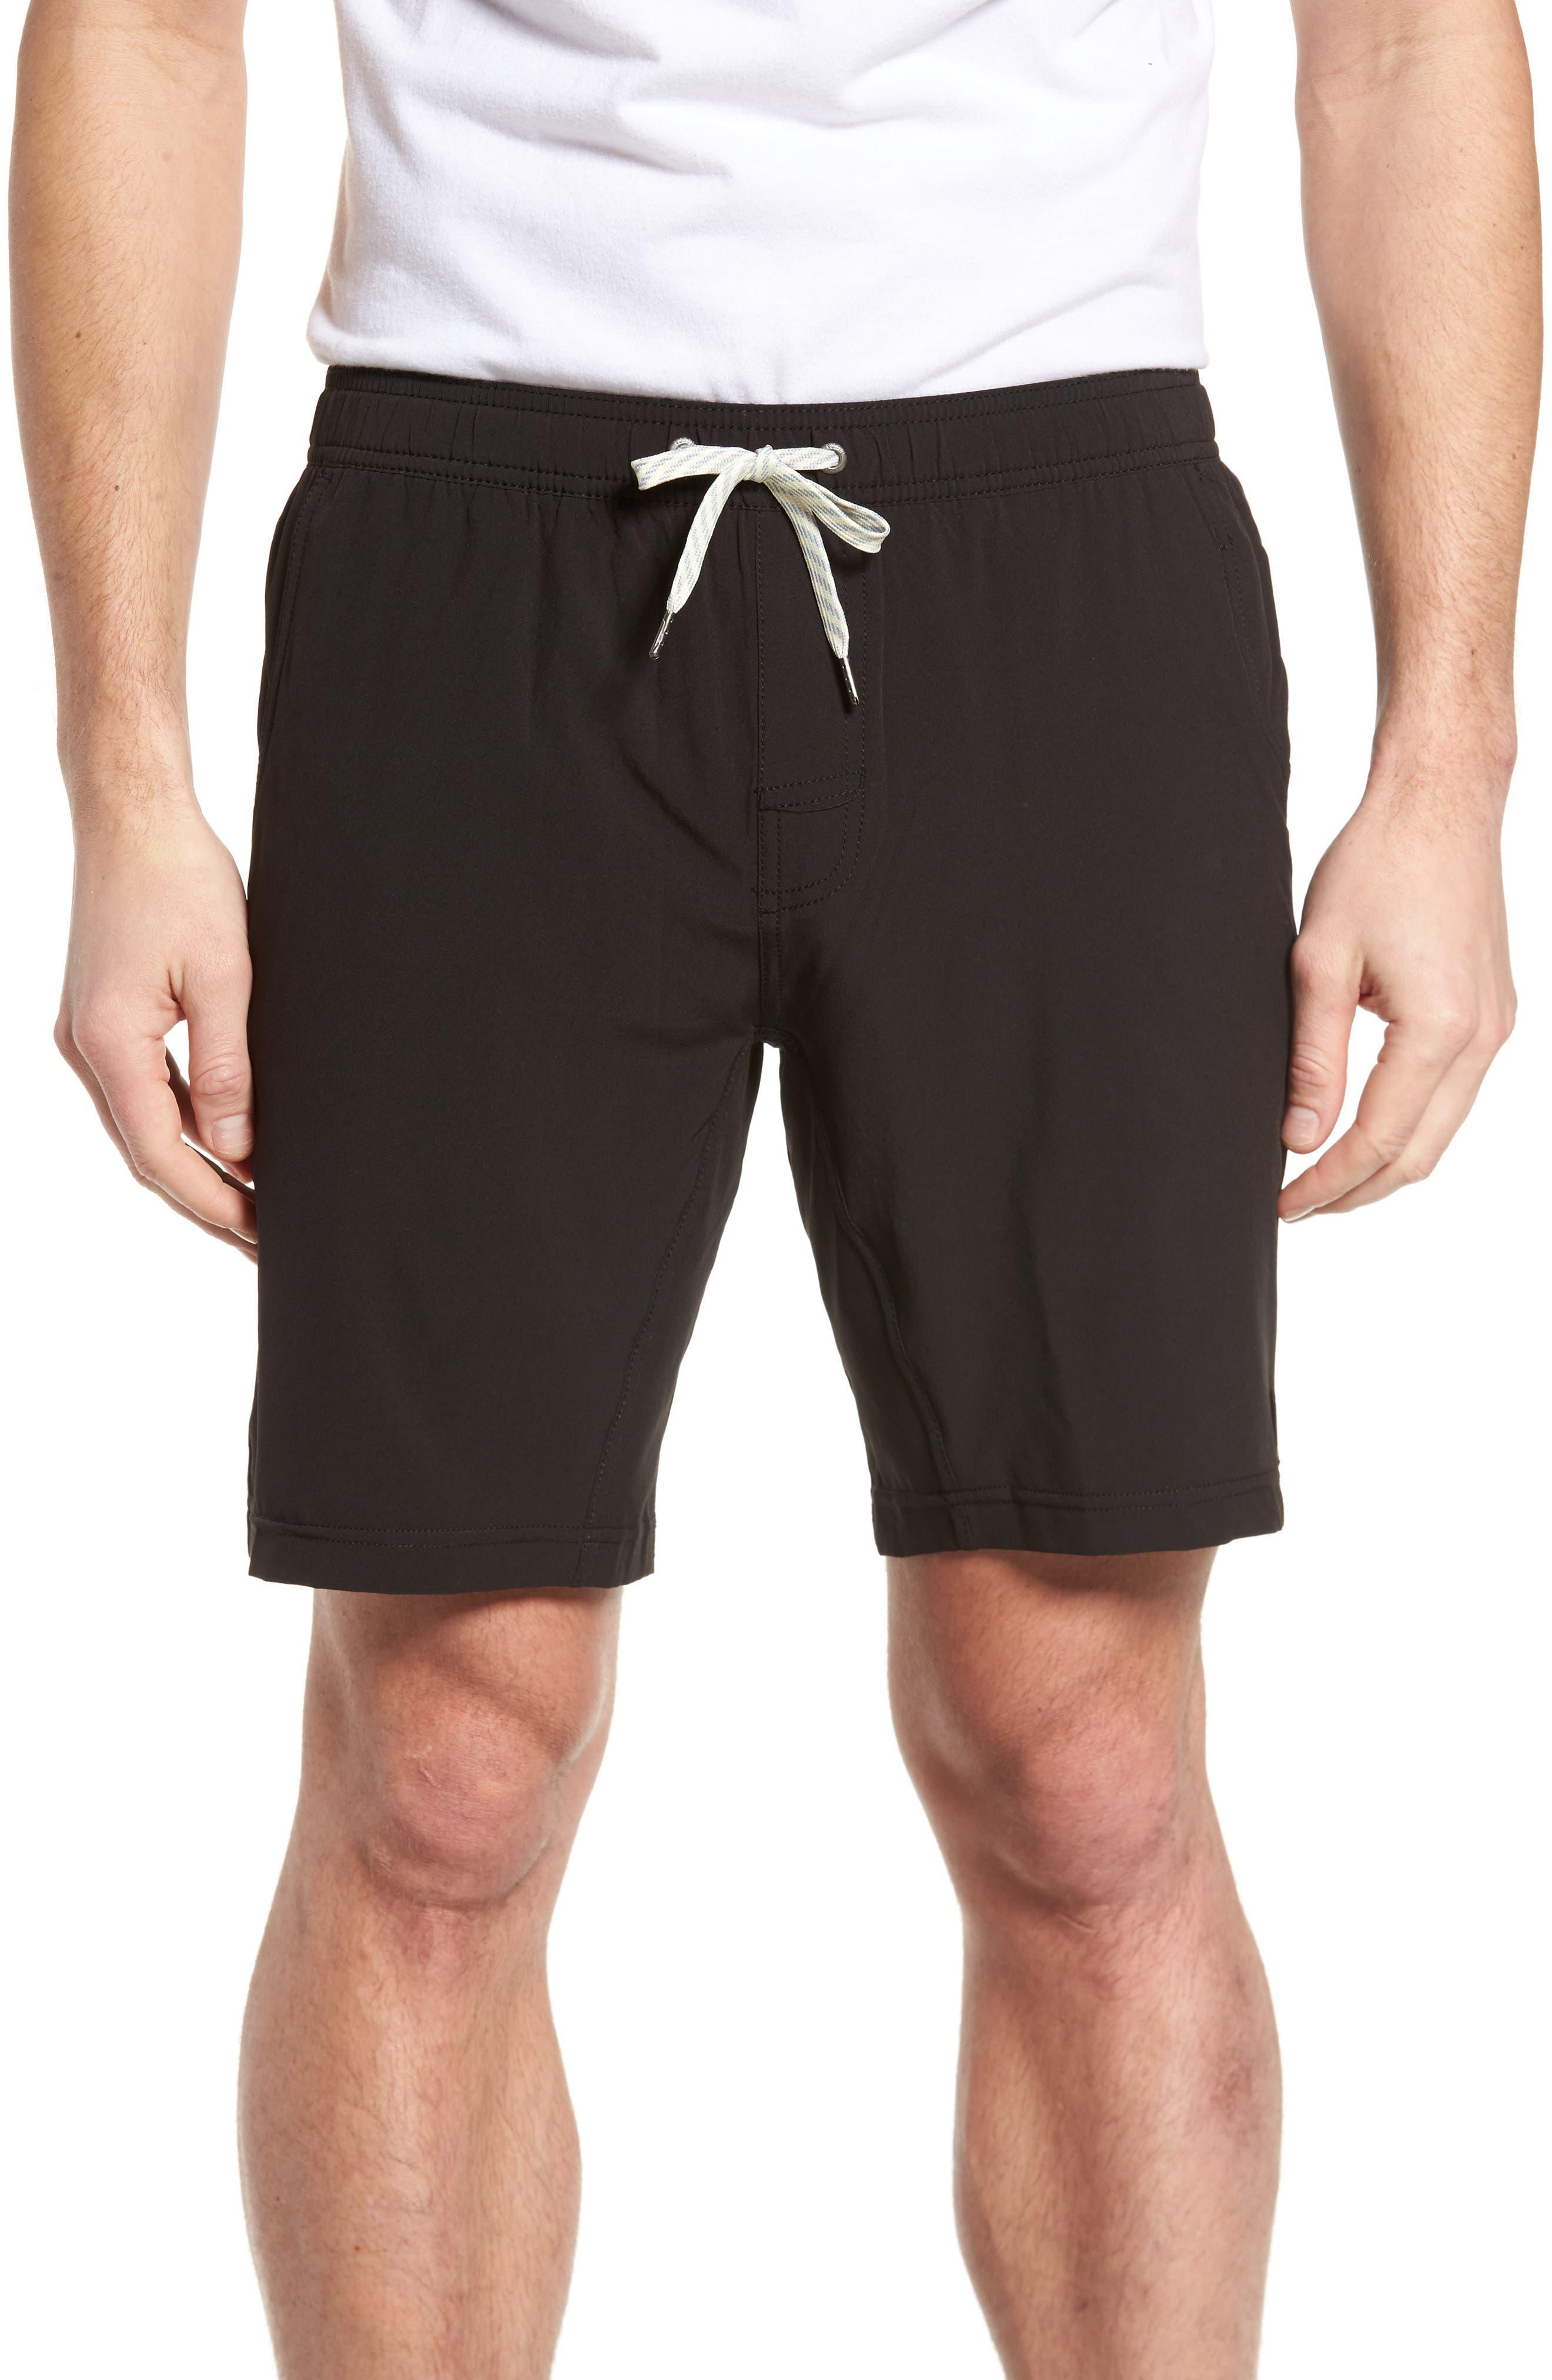 Kore Shorts,                             Main thumbnail 1, color,                             BLACK